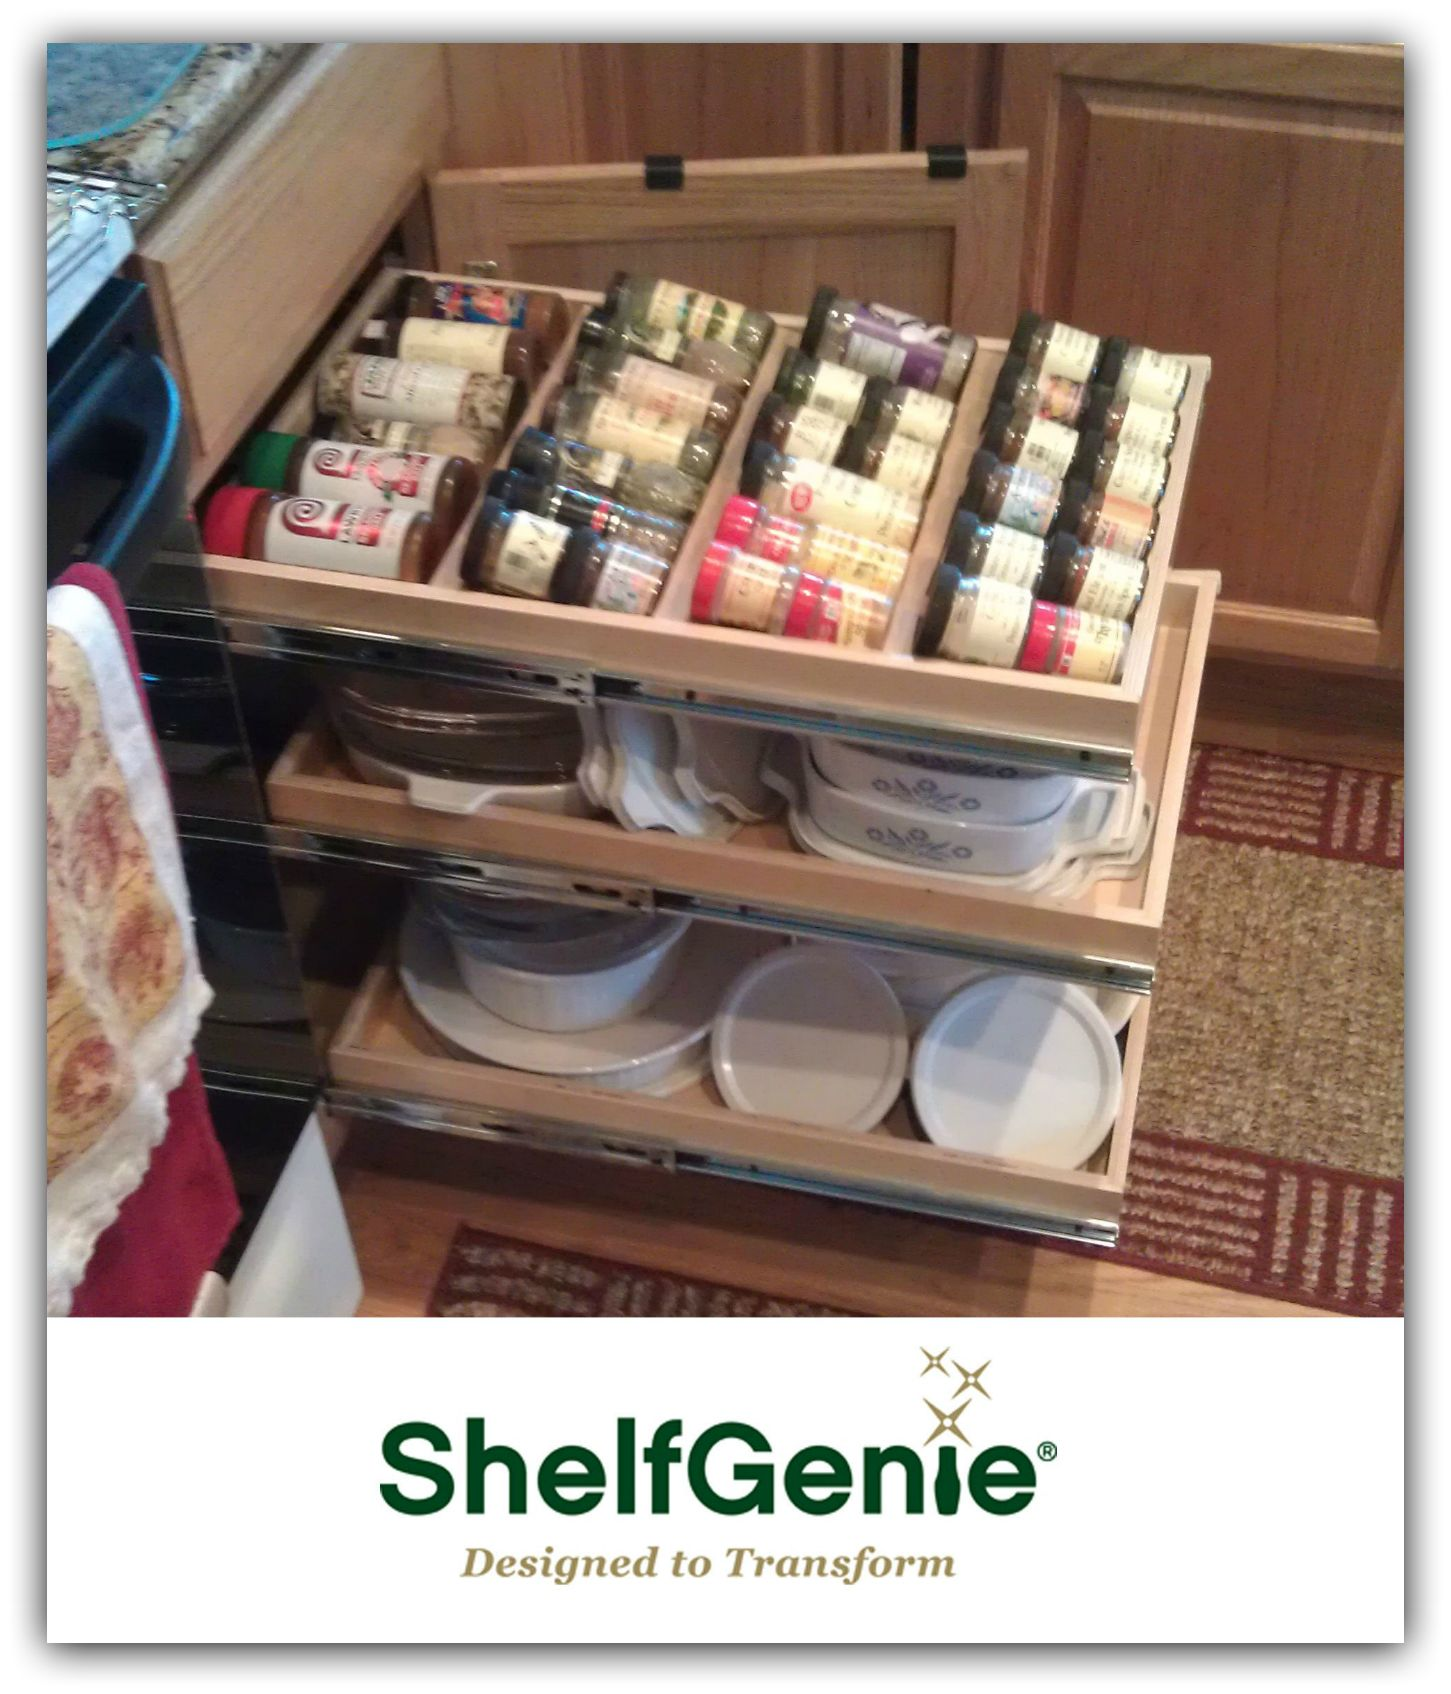 ShelfGenie custom roll out shelves for your Atlanta kitchen